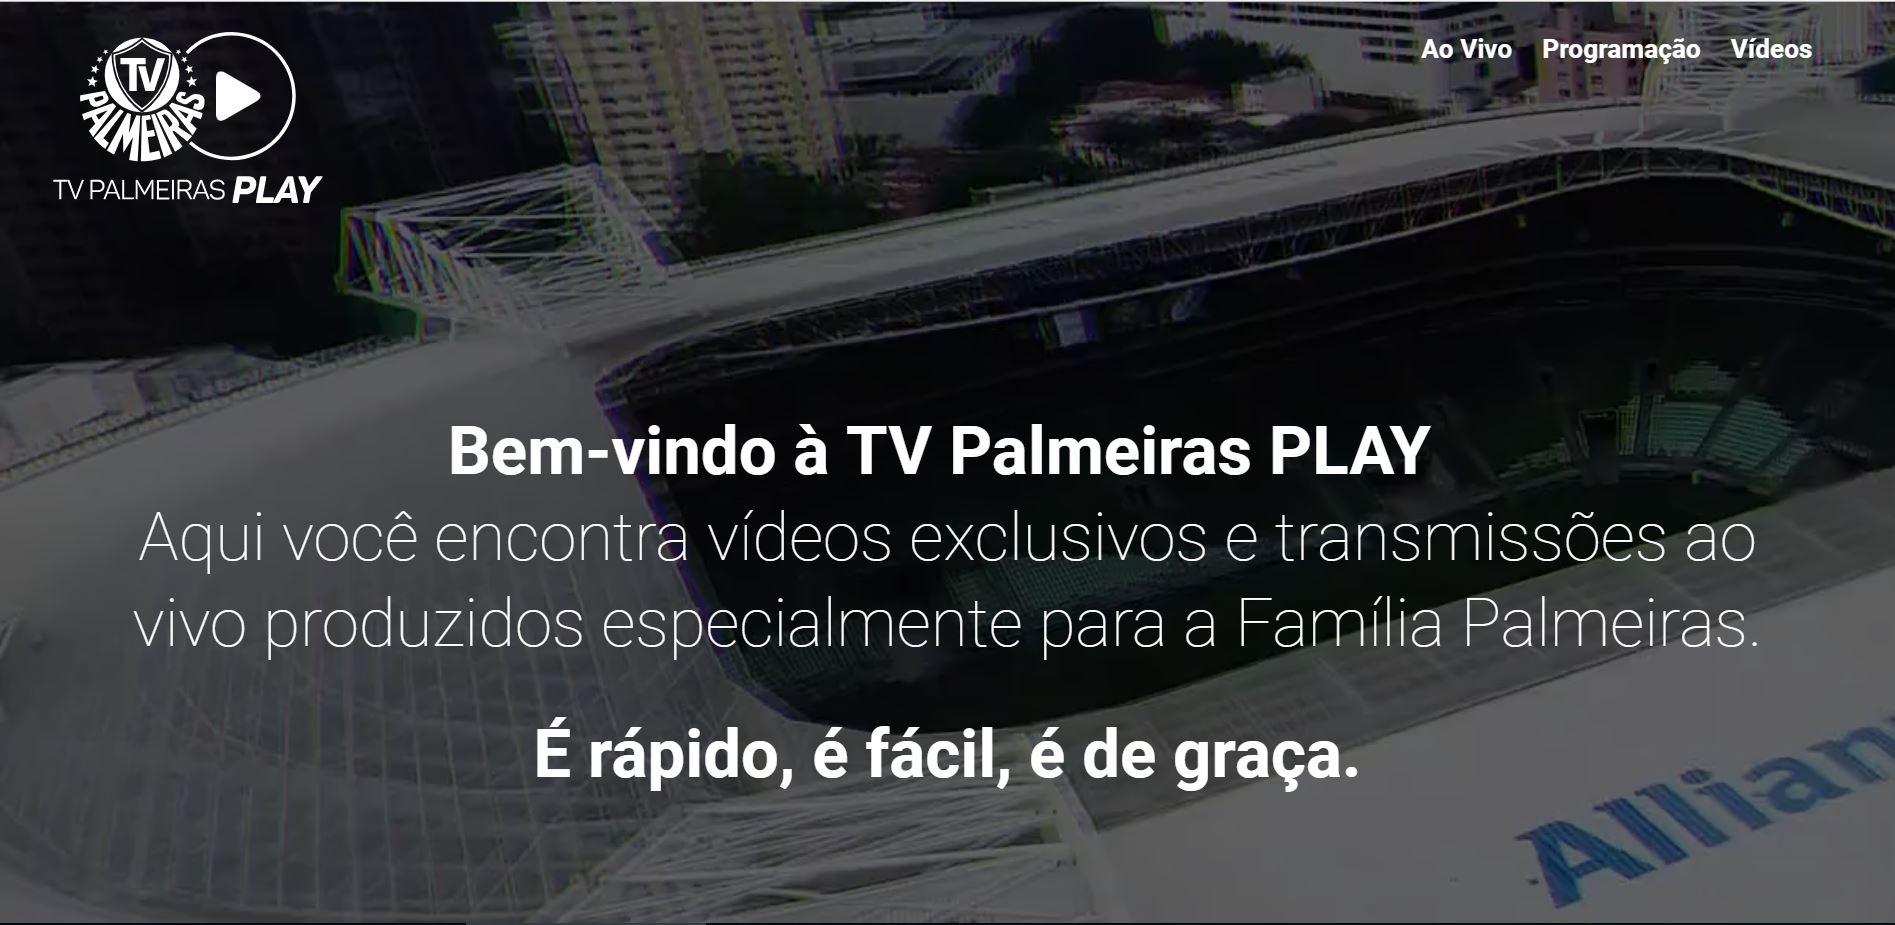 screen capture tv palmeiras play homepage